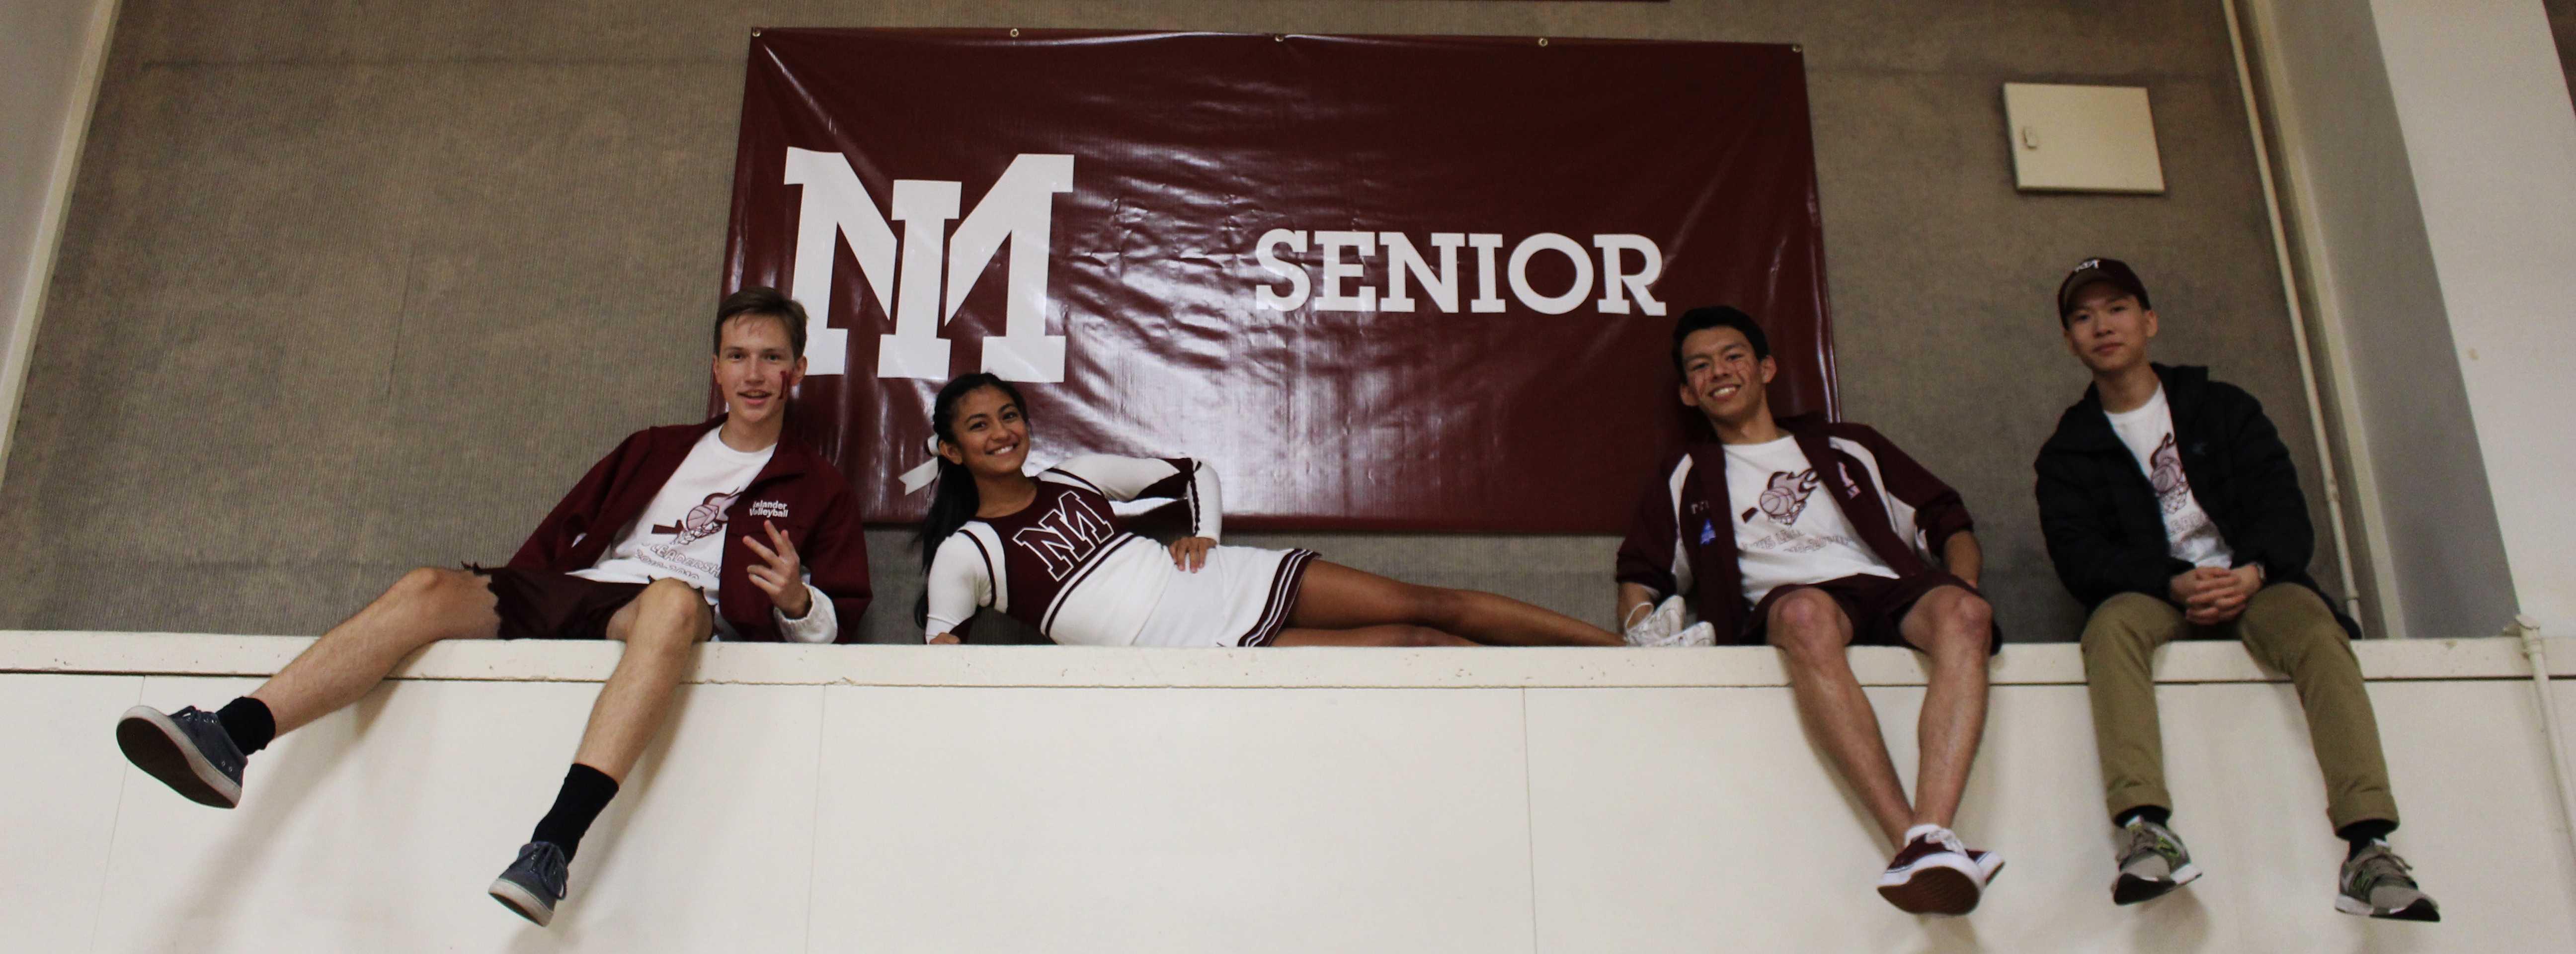 senior officers